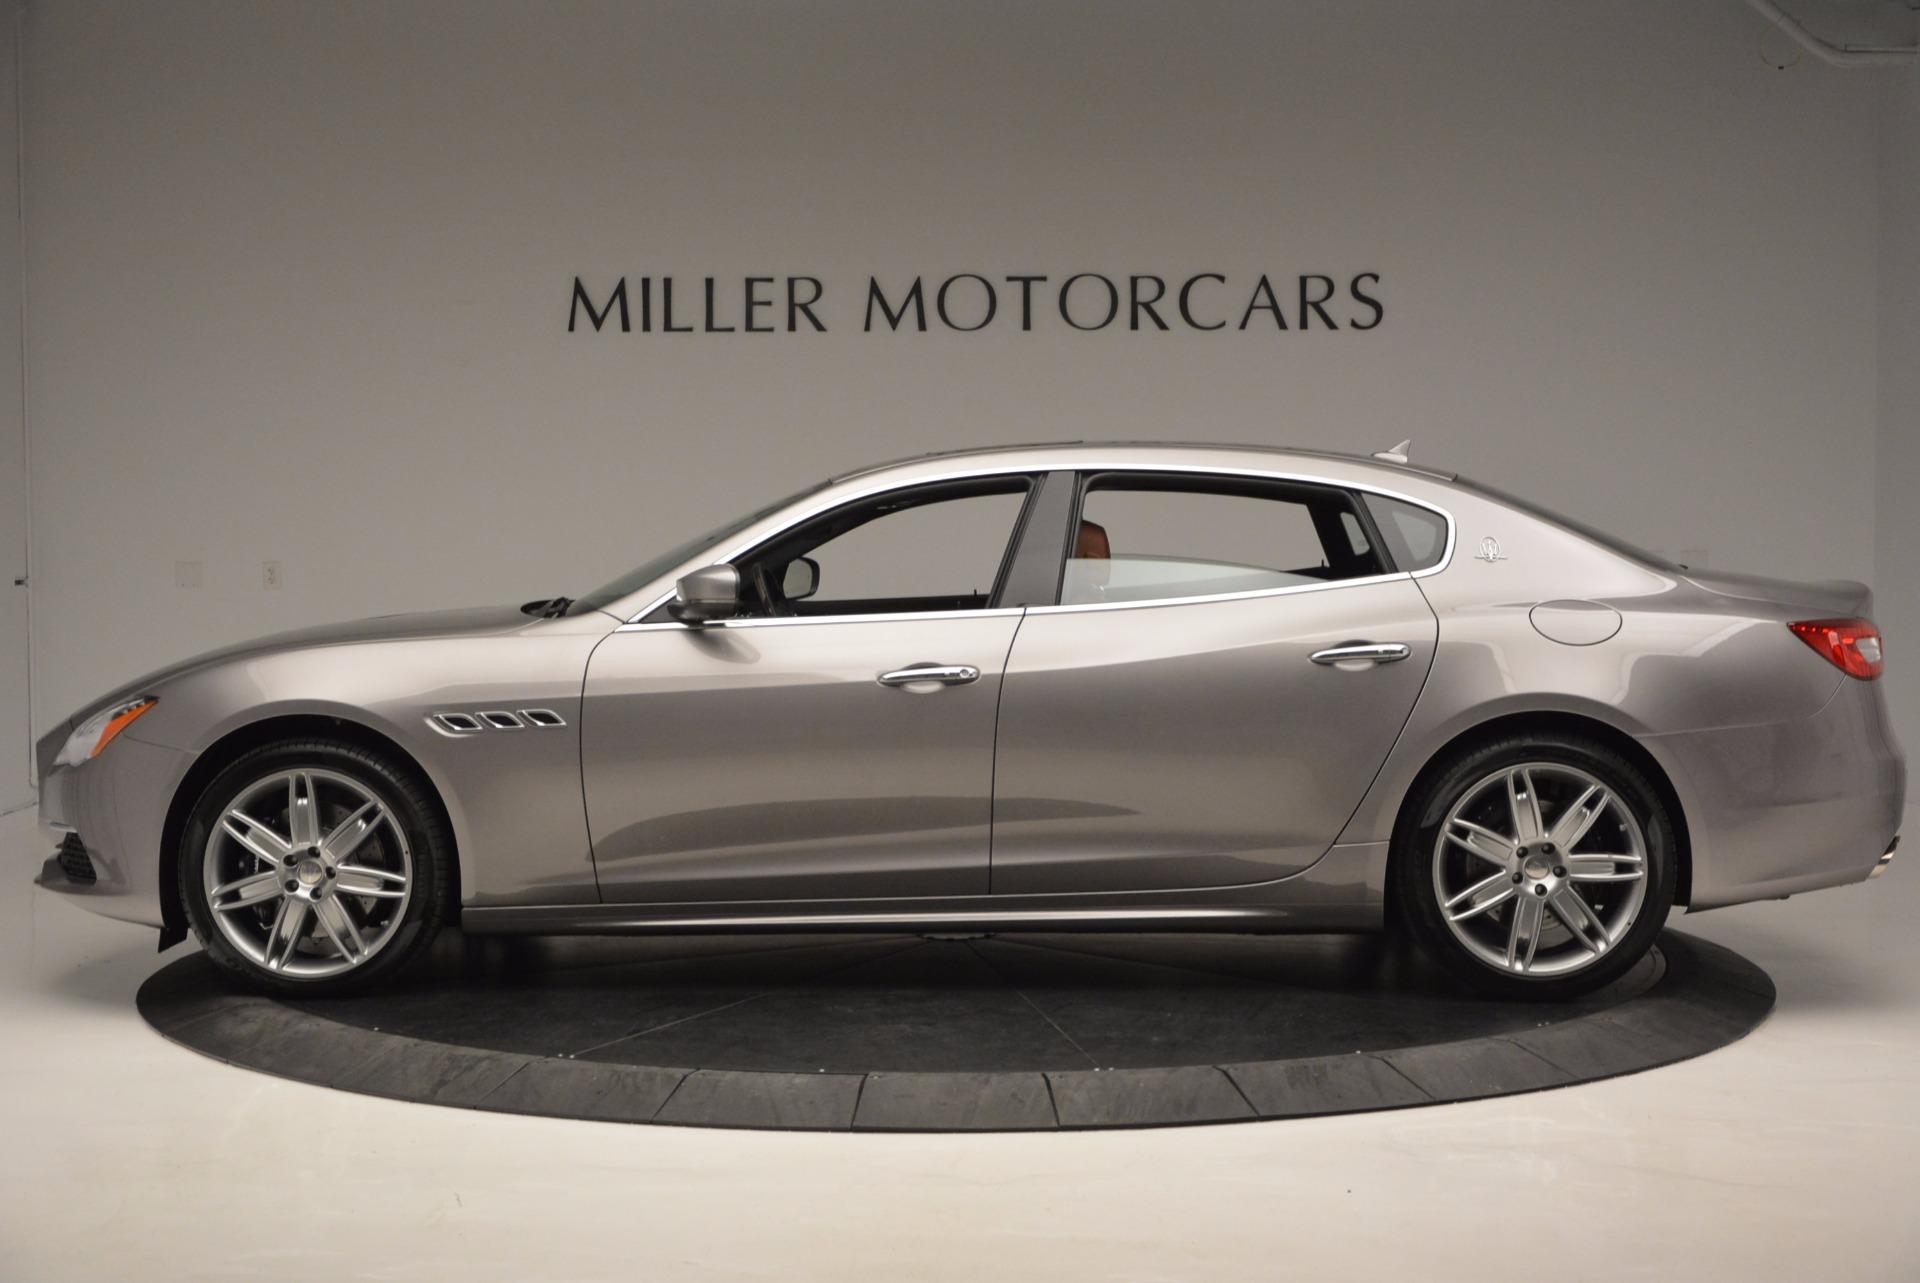 New 2017 Maserati Quattroporte S Q4 GranLusso